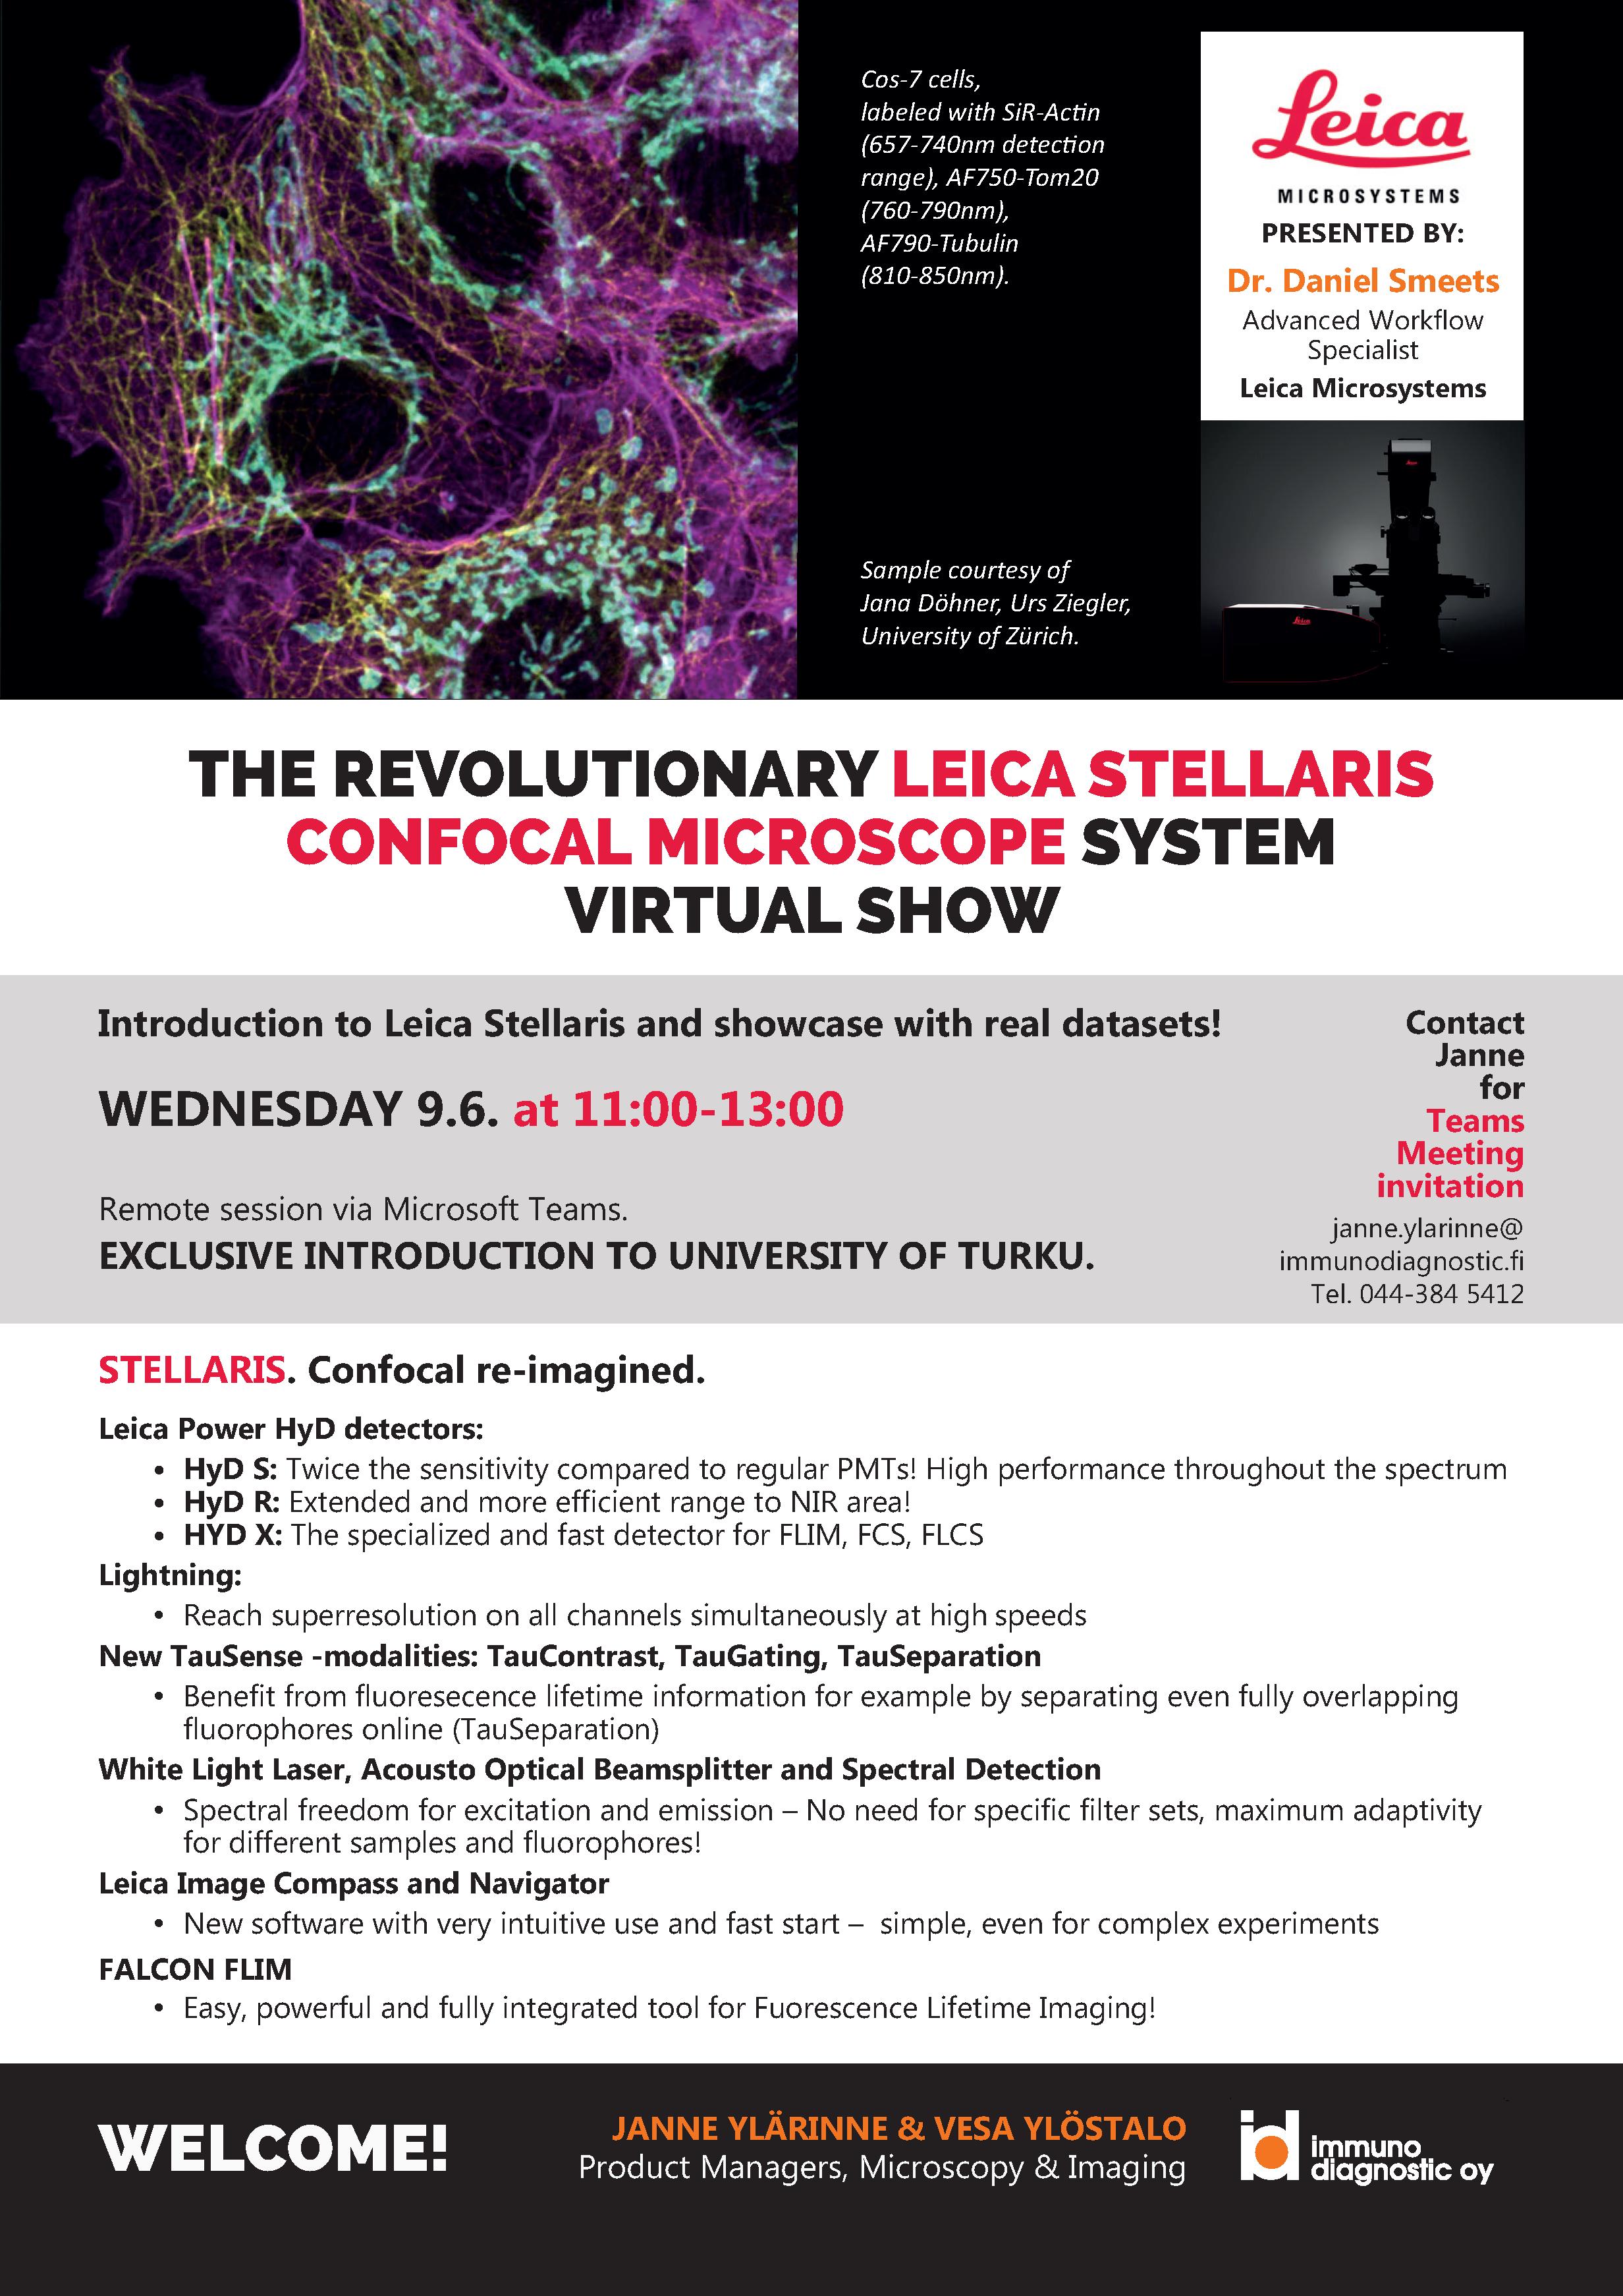 Welcome to Leica Stellaris virtual show